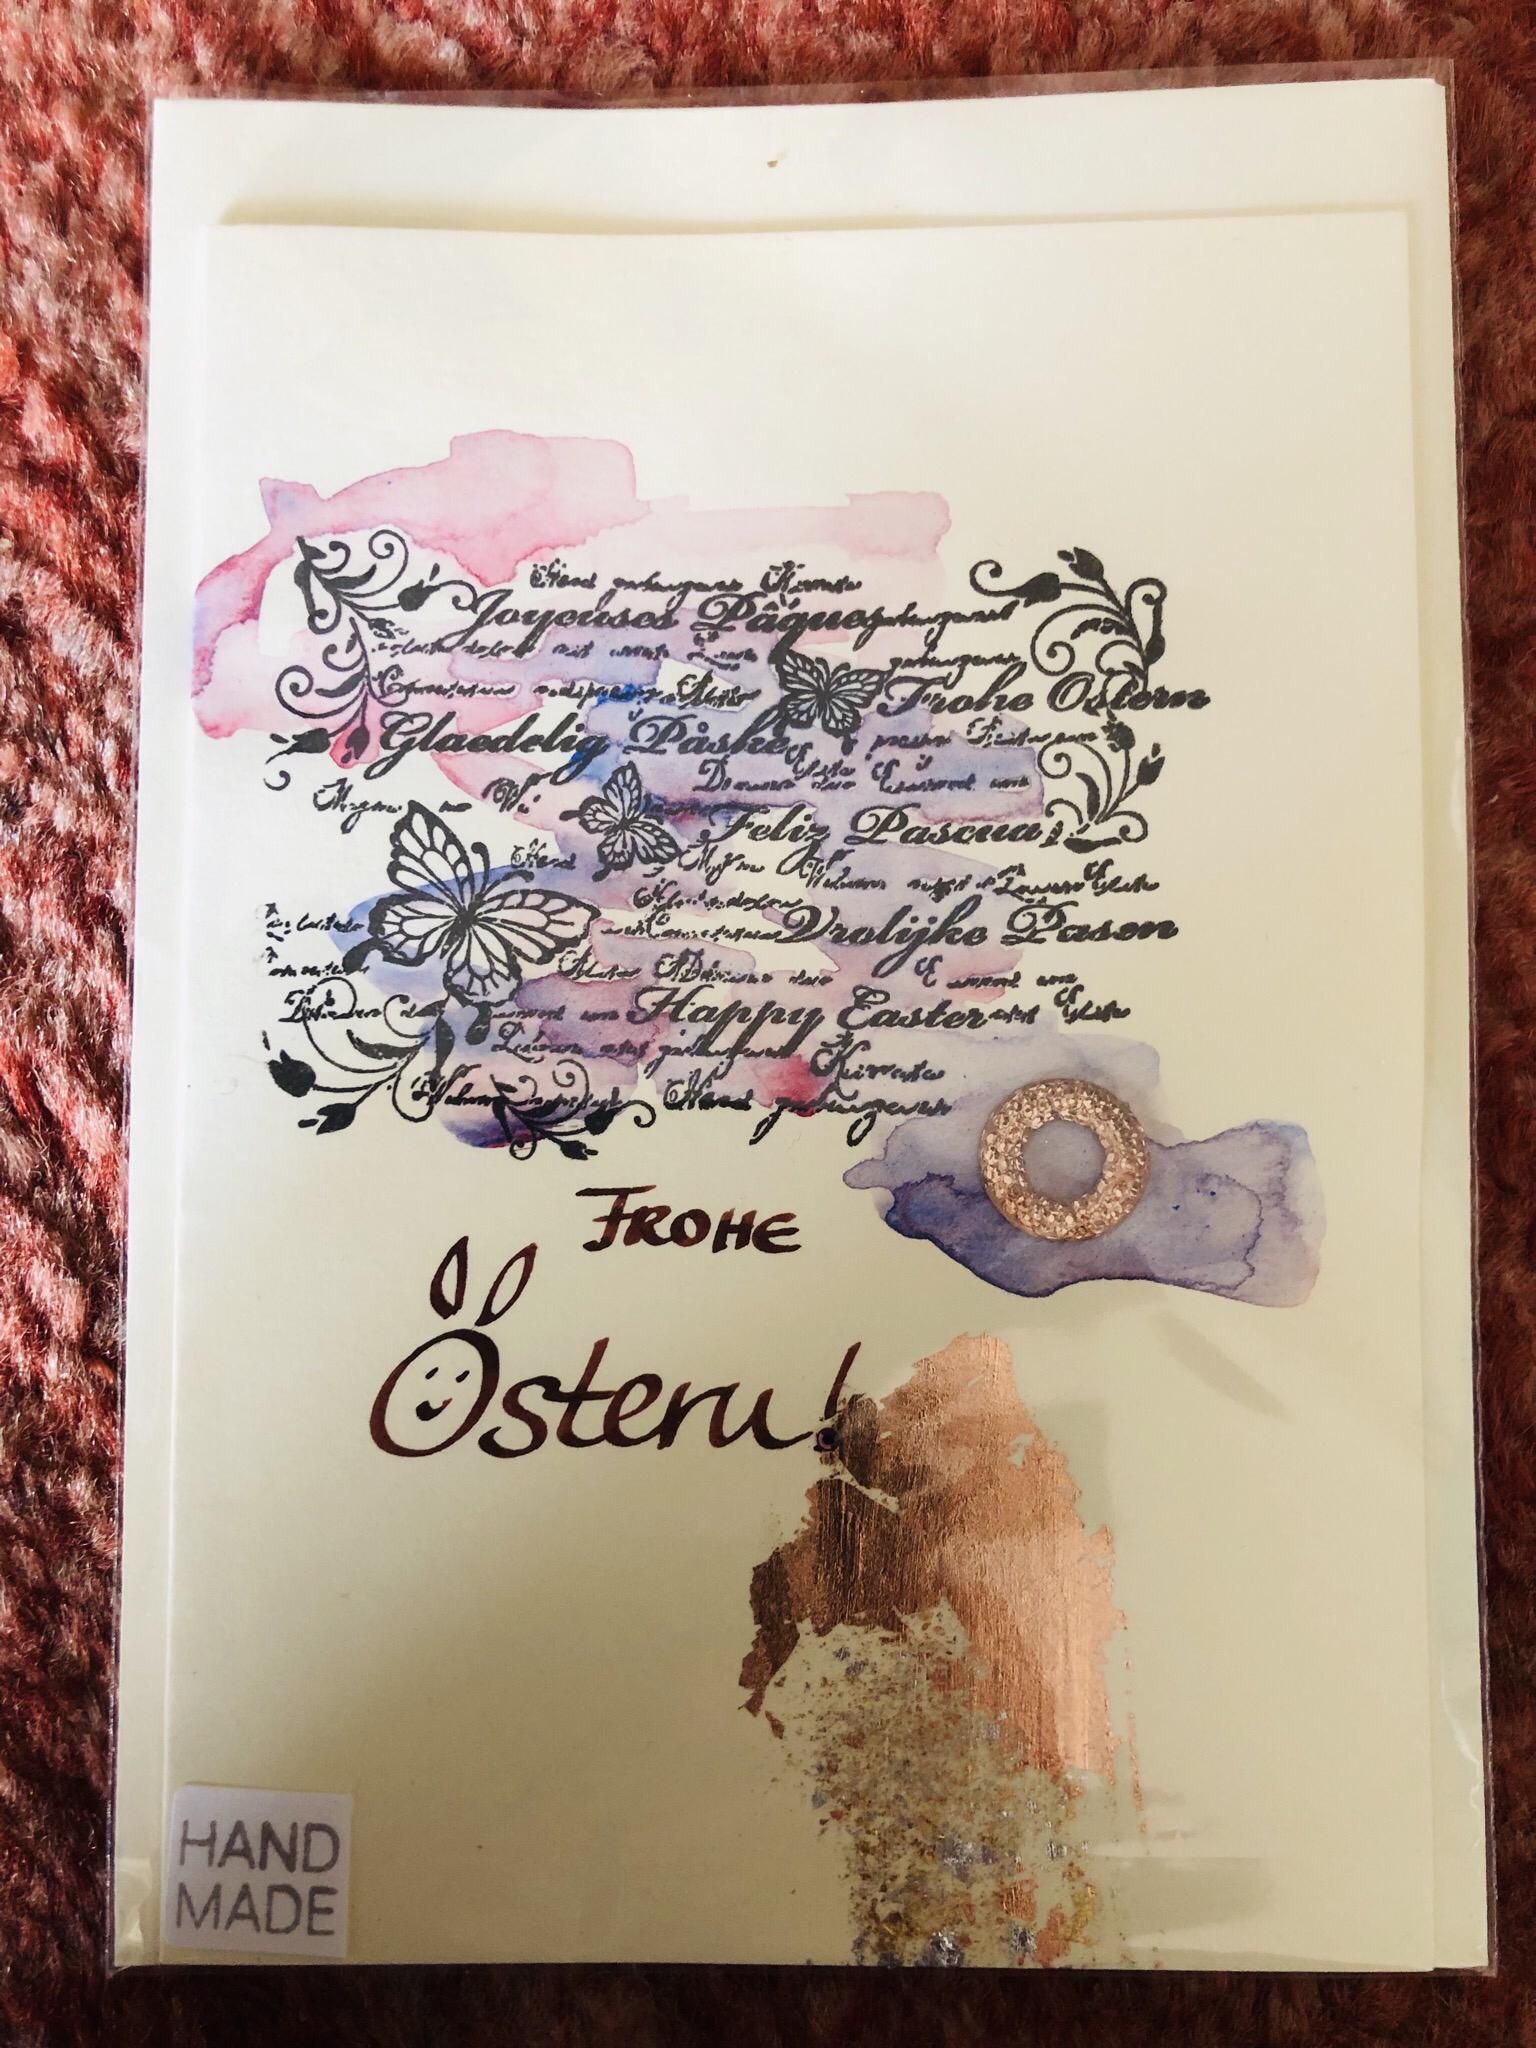 "Karte ""handmade"" - Ostern Text - Frohe Ostern! 25074"